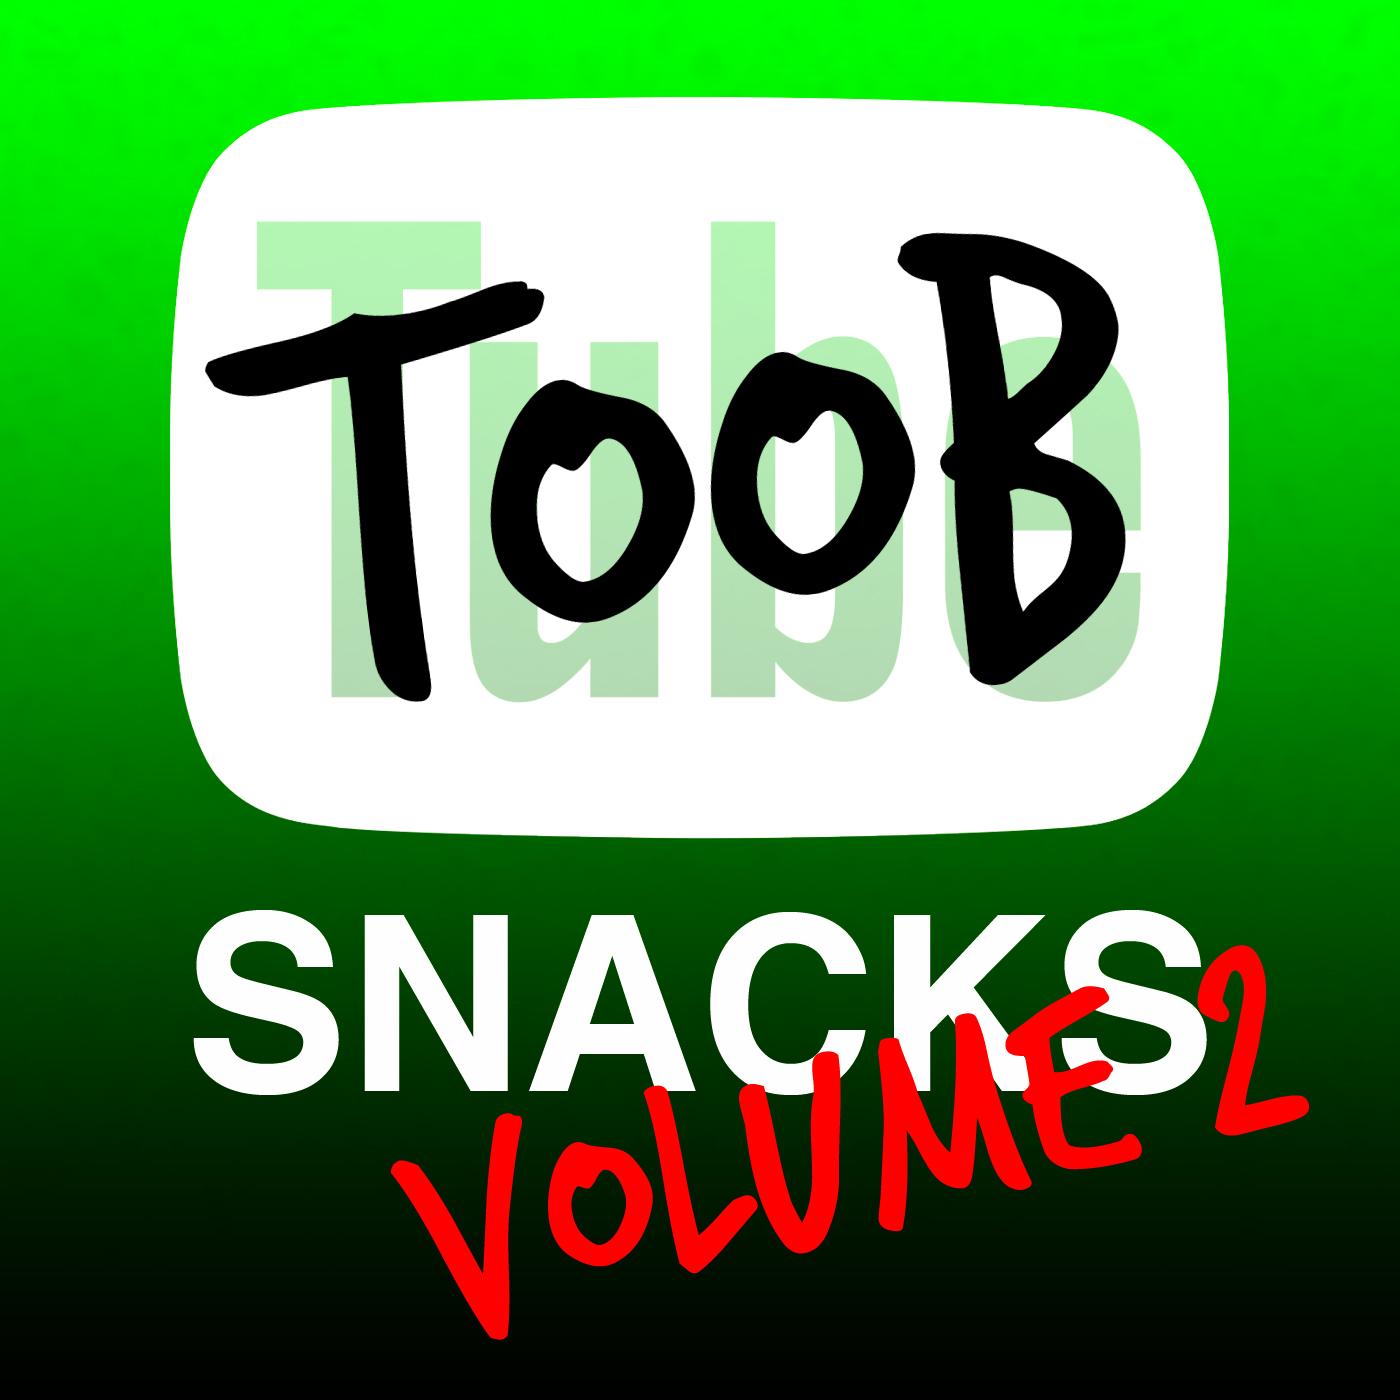 Toob Snacks 2